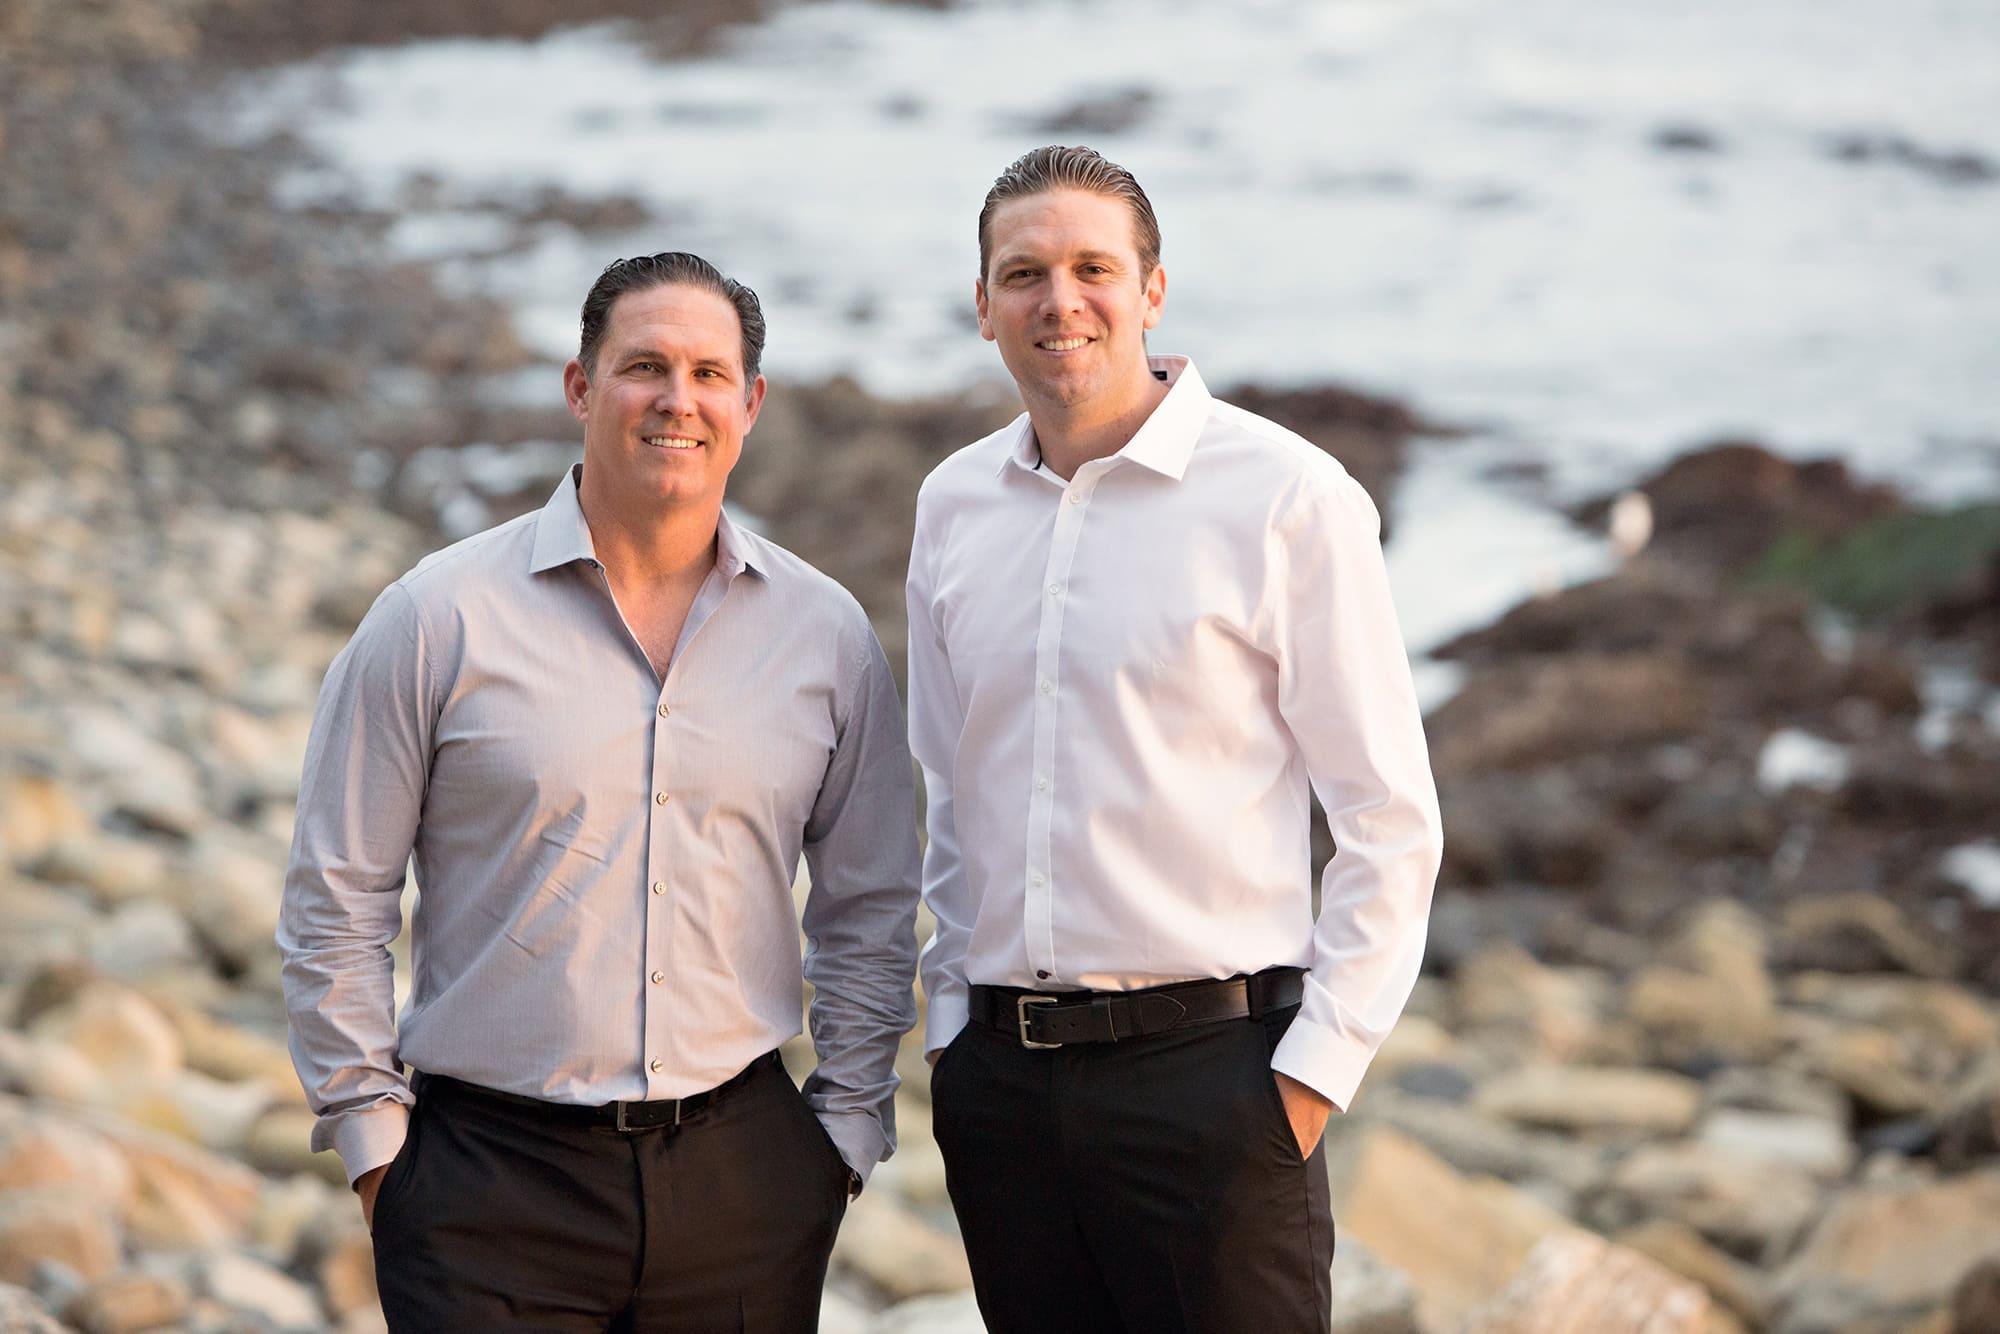 Photo of Mike Harper and Peter Hazdovac of San Pedro California